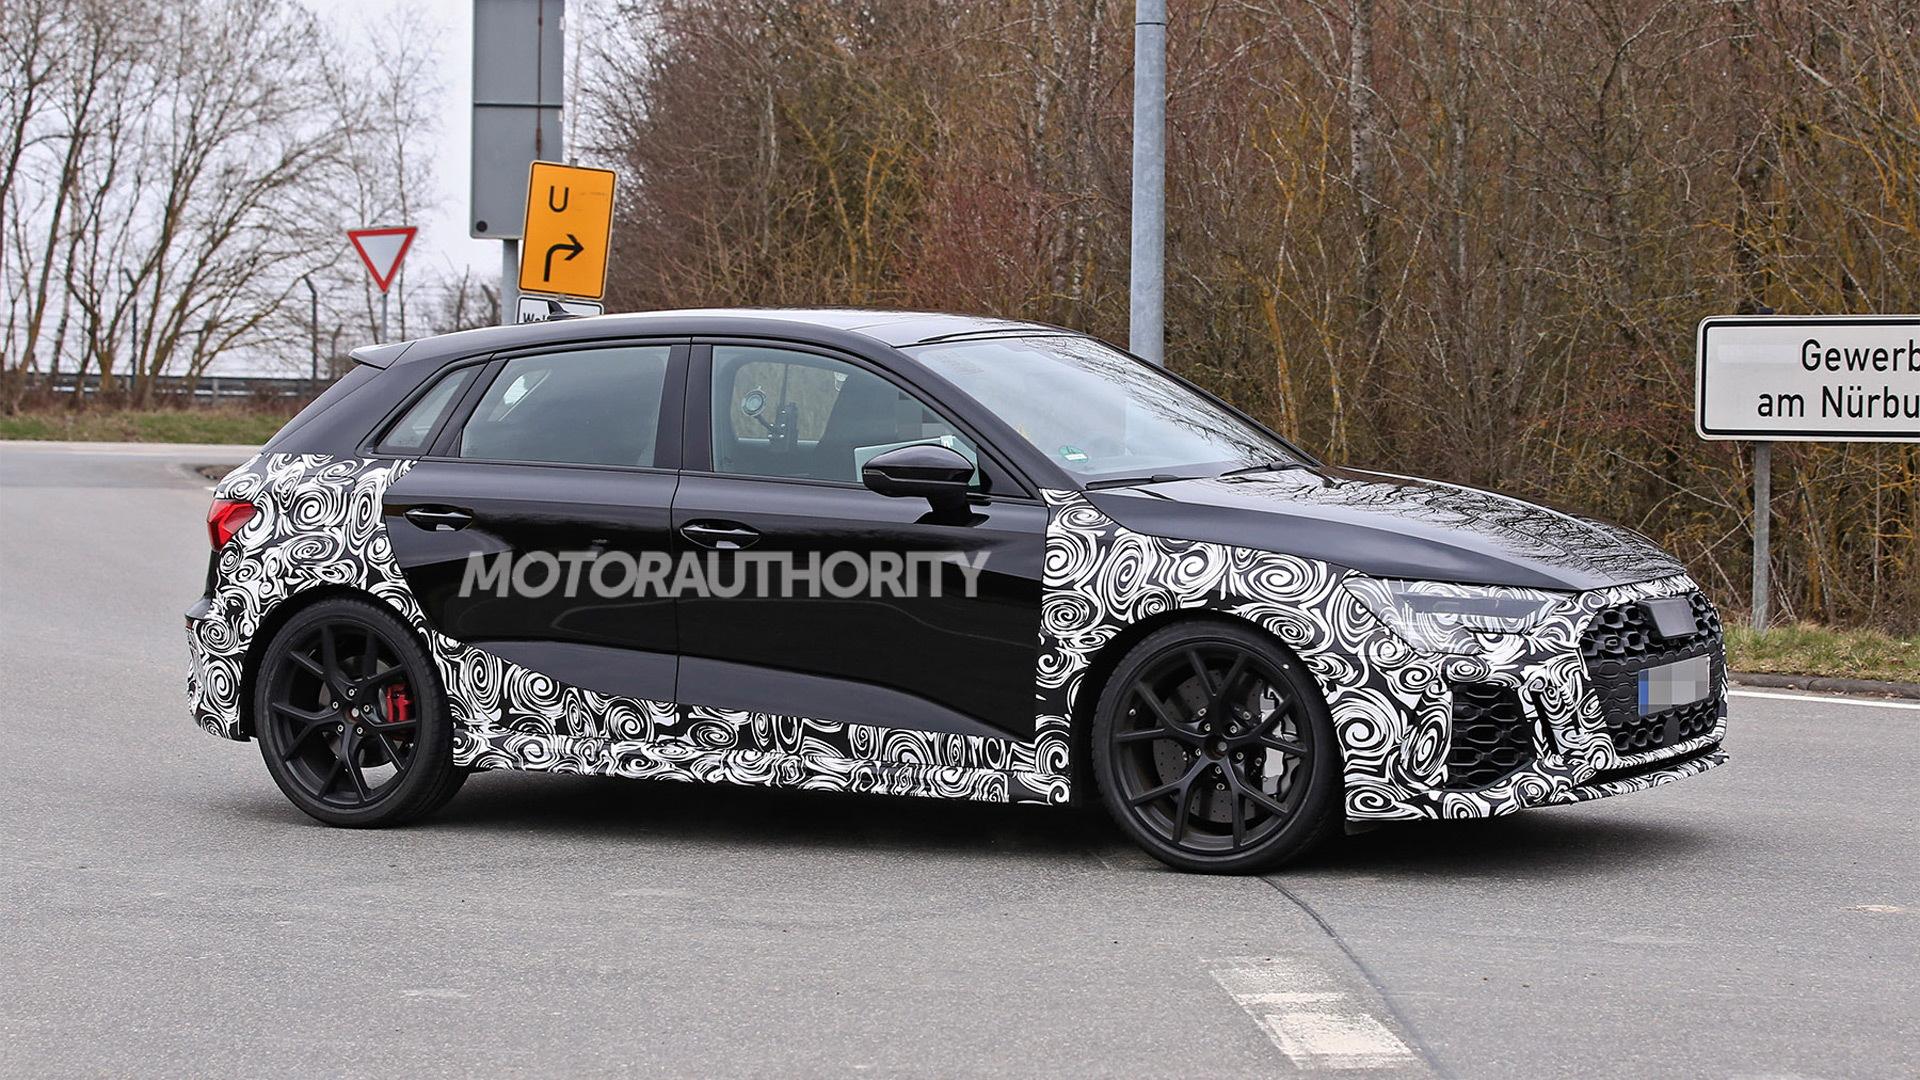 2022 Audi RS 3 Sportback spy shots - Photo credit: S. Baldauf/SB-Medien